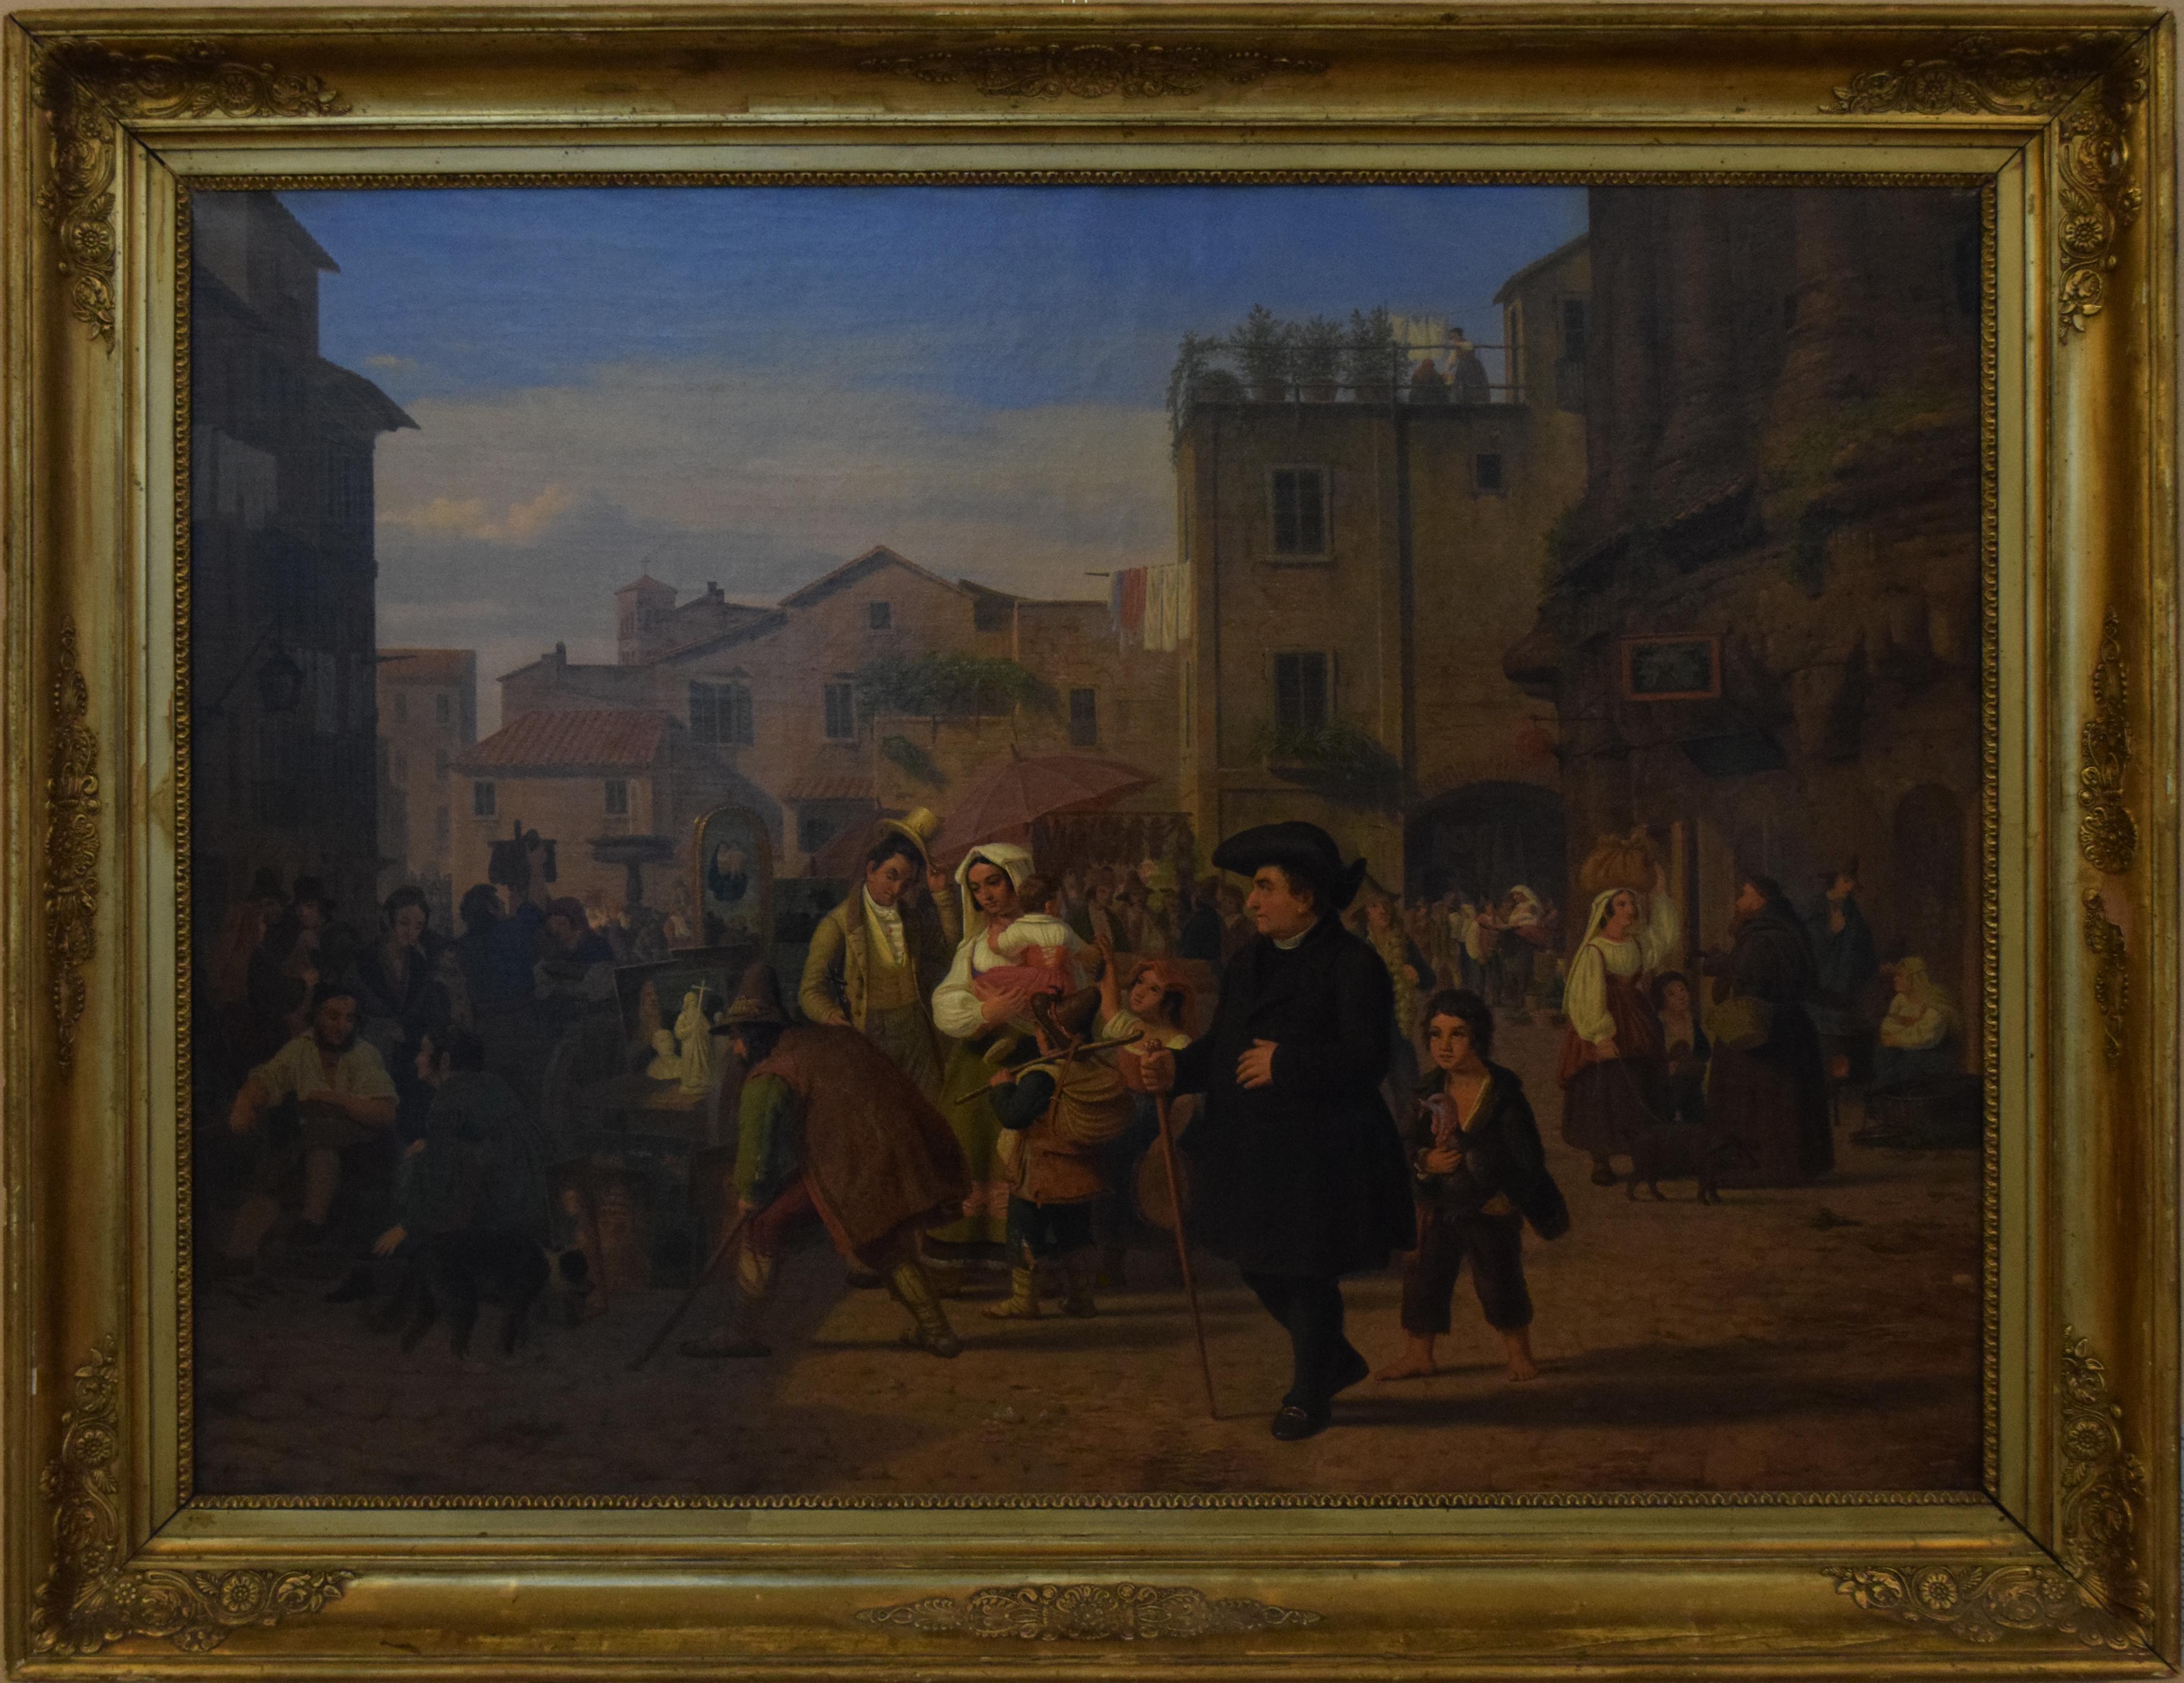 27-peter-raadsig-1806-1882-piazza-montanara-teatro-marcello-roma